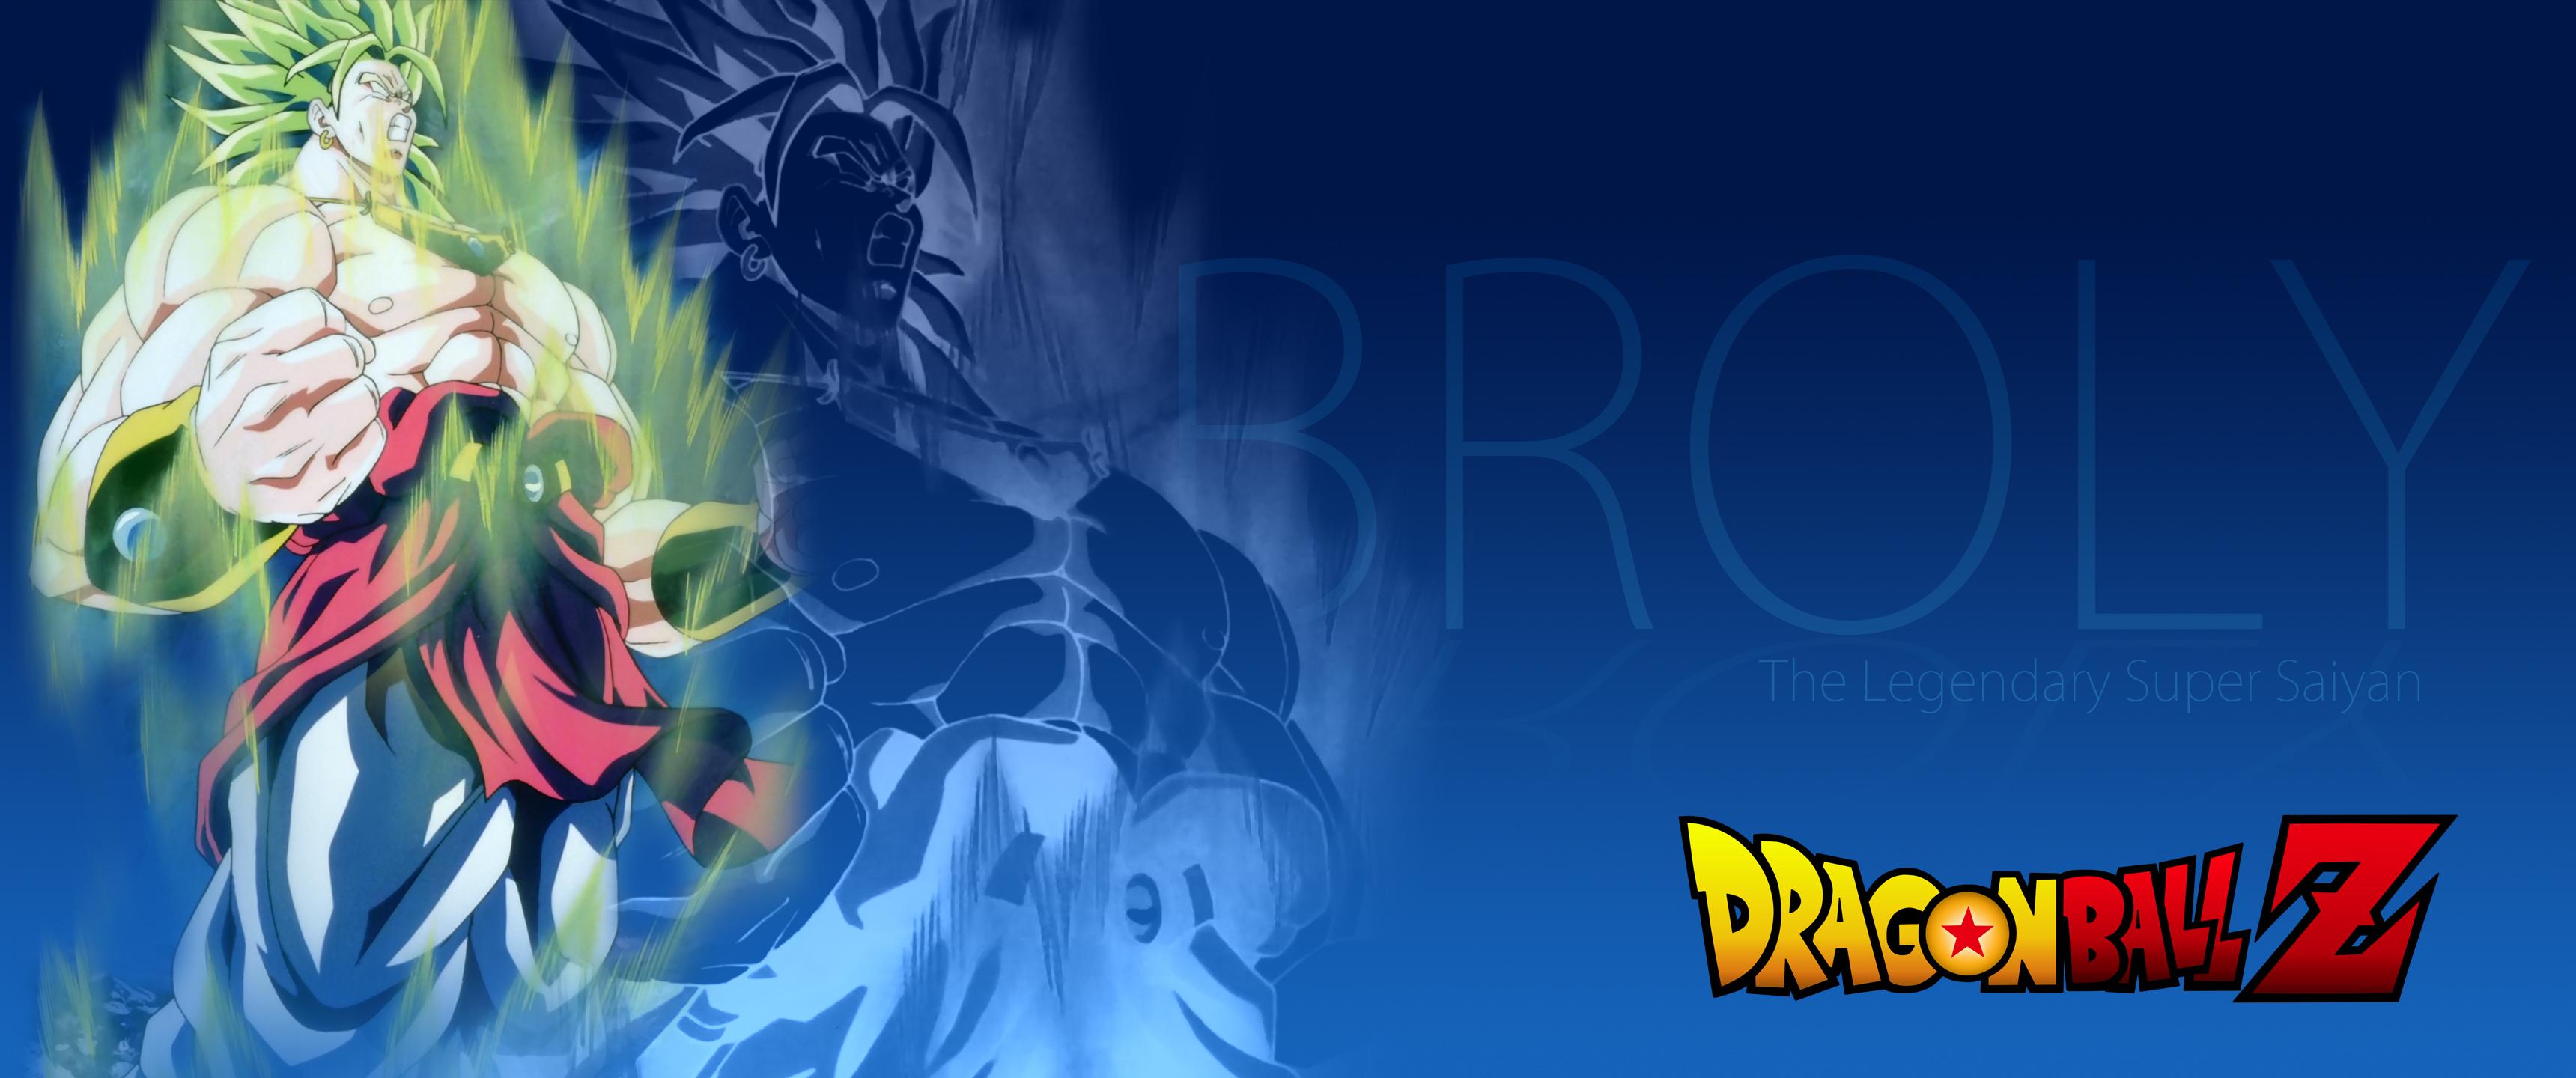 dual monitor anime wallpaper reddit